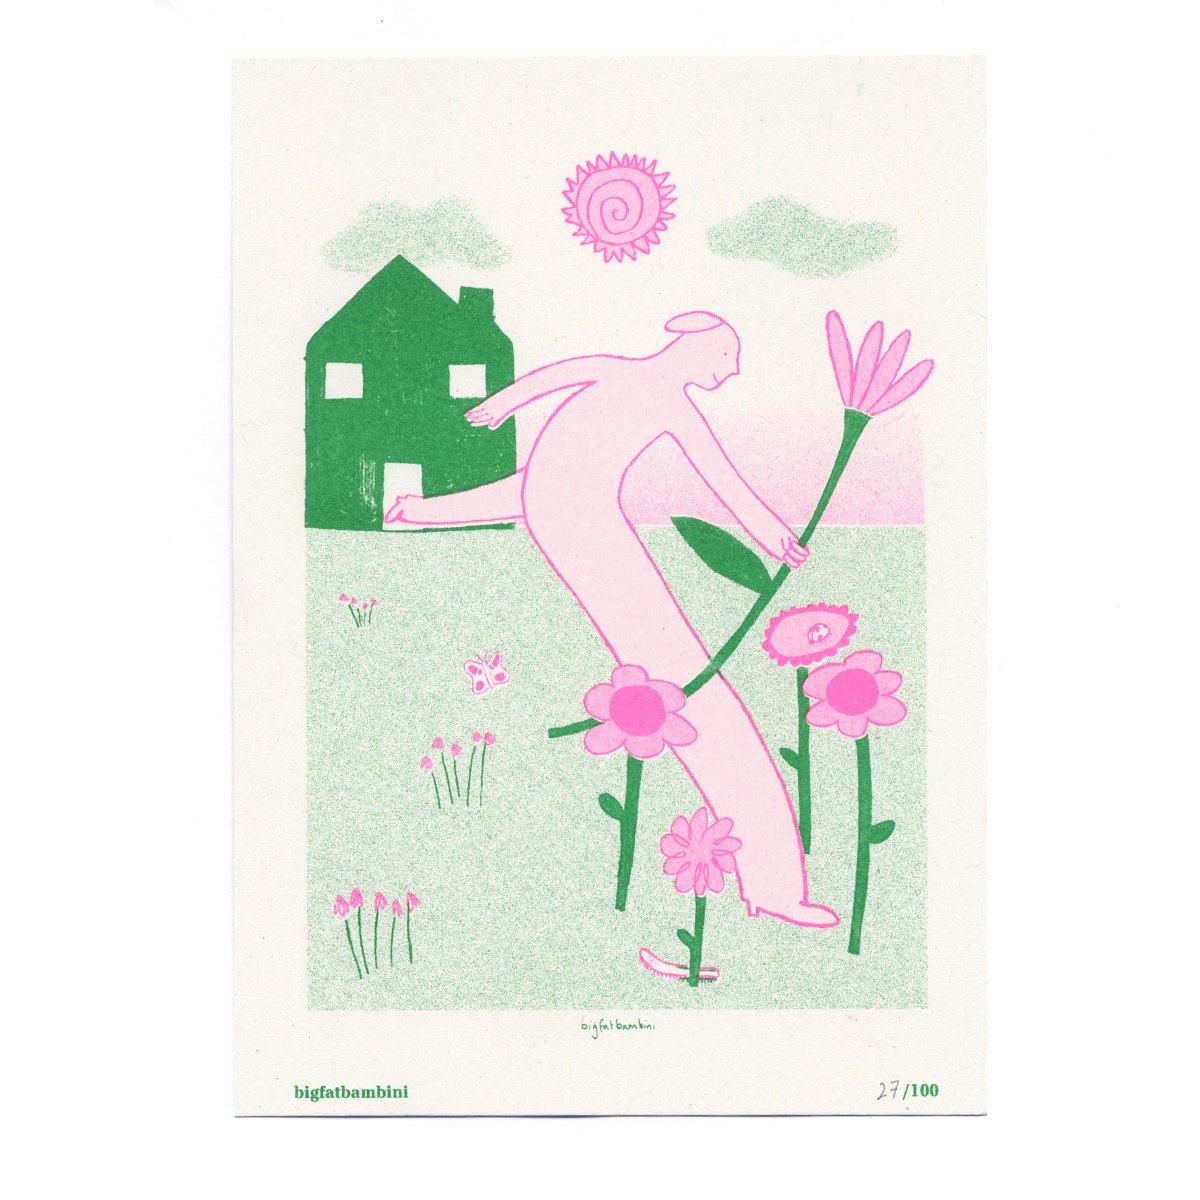 Image of Big Fat Bambini - Seed Artist Series Riso Print